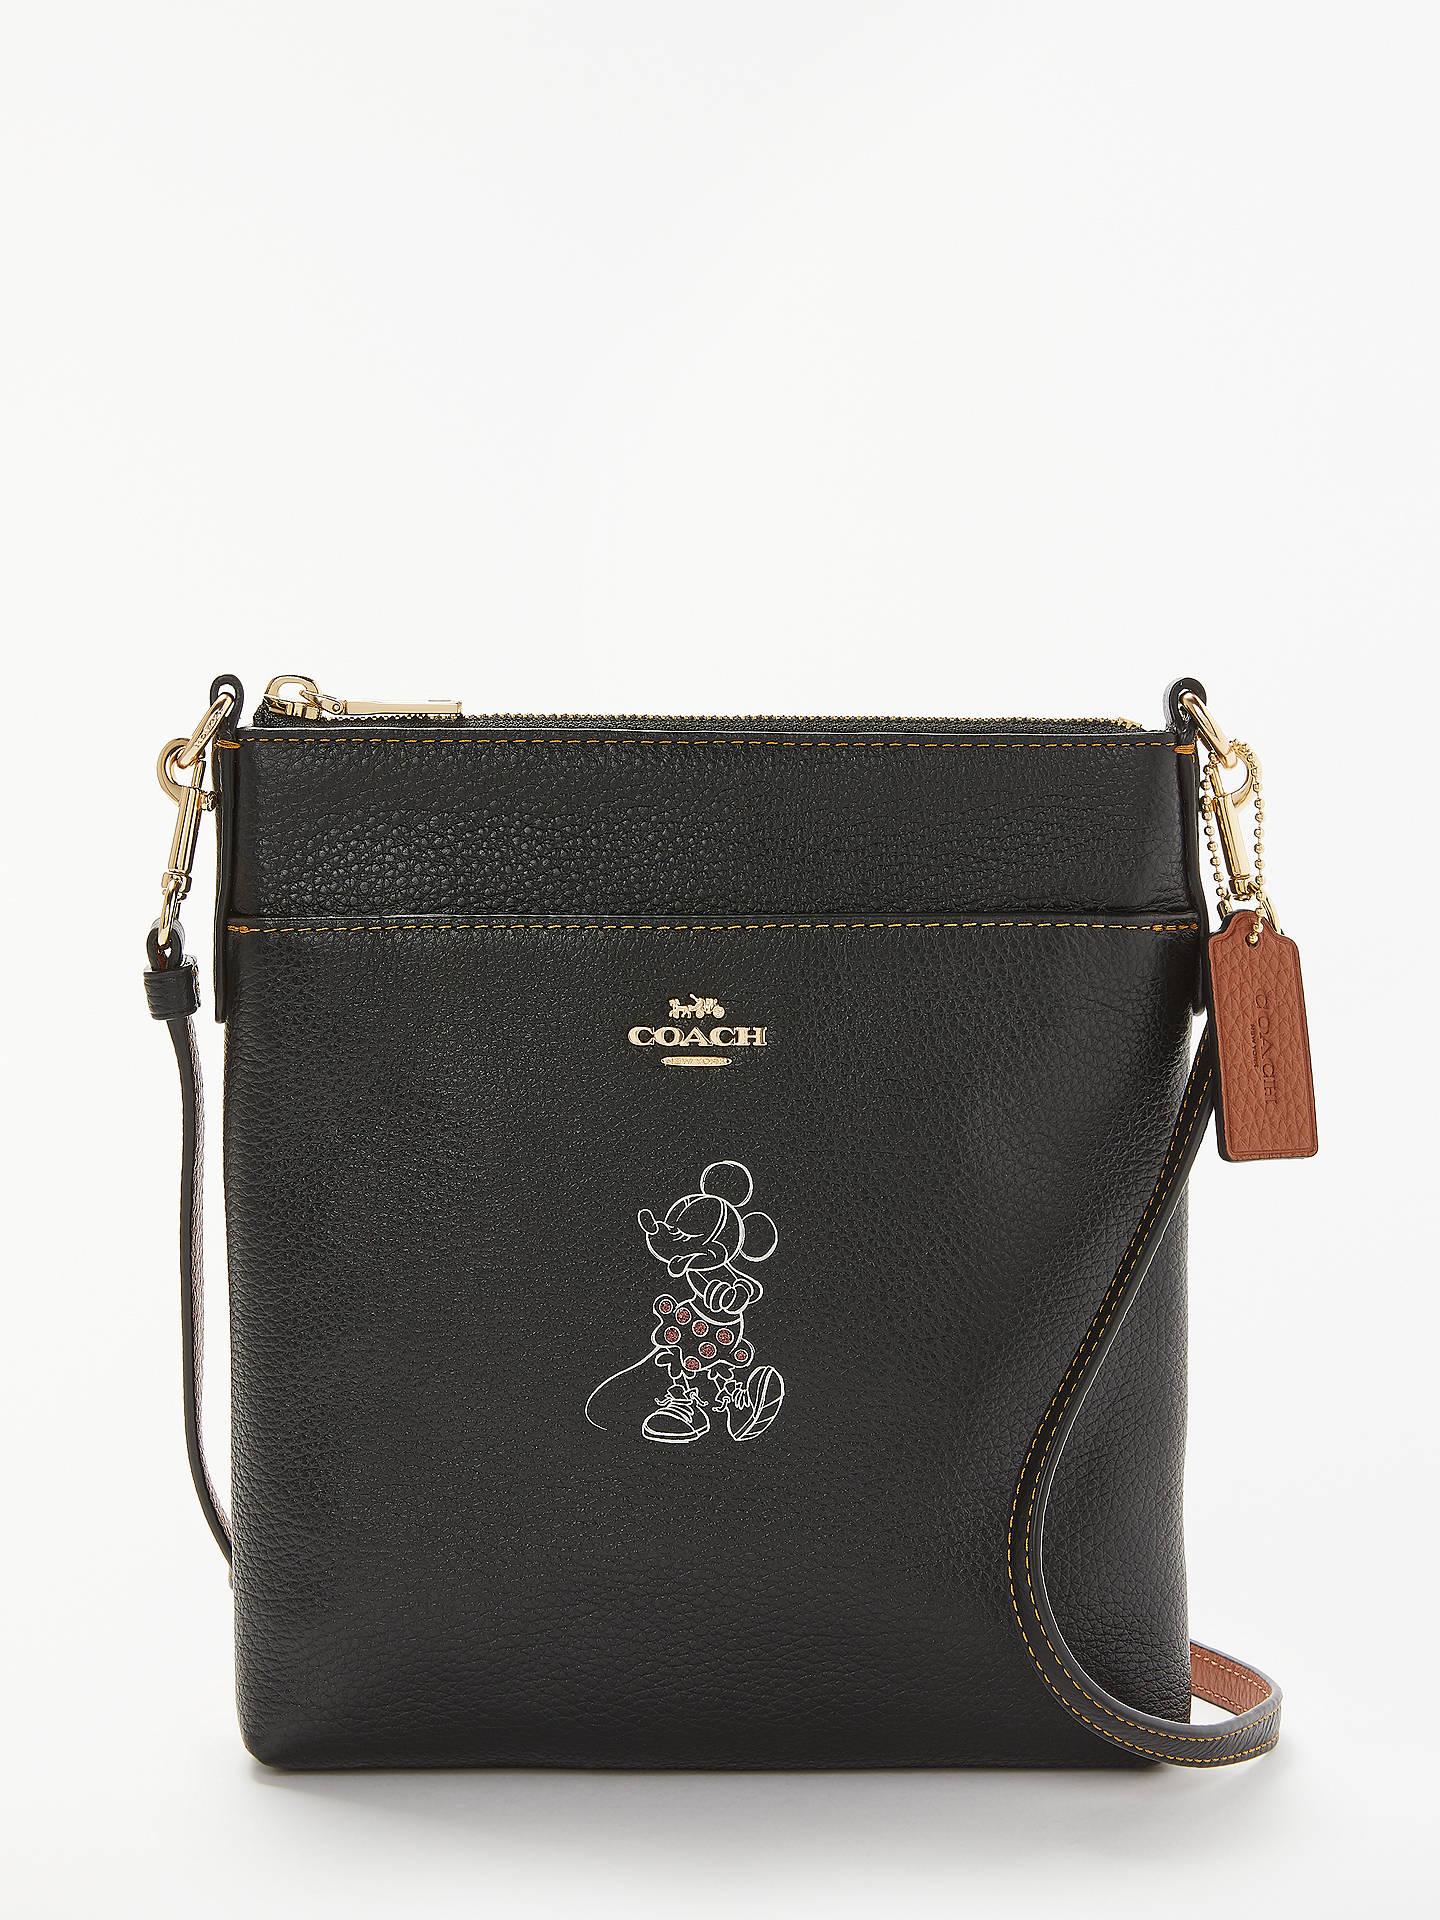 f49448344 Buy Disney x Coach Minnie Leather Messenger Cross Body Bag, Black Online at  johnlewis.